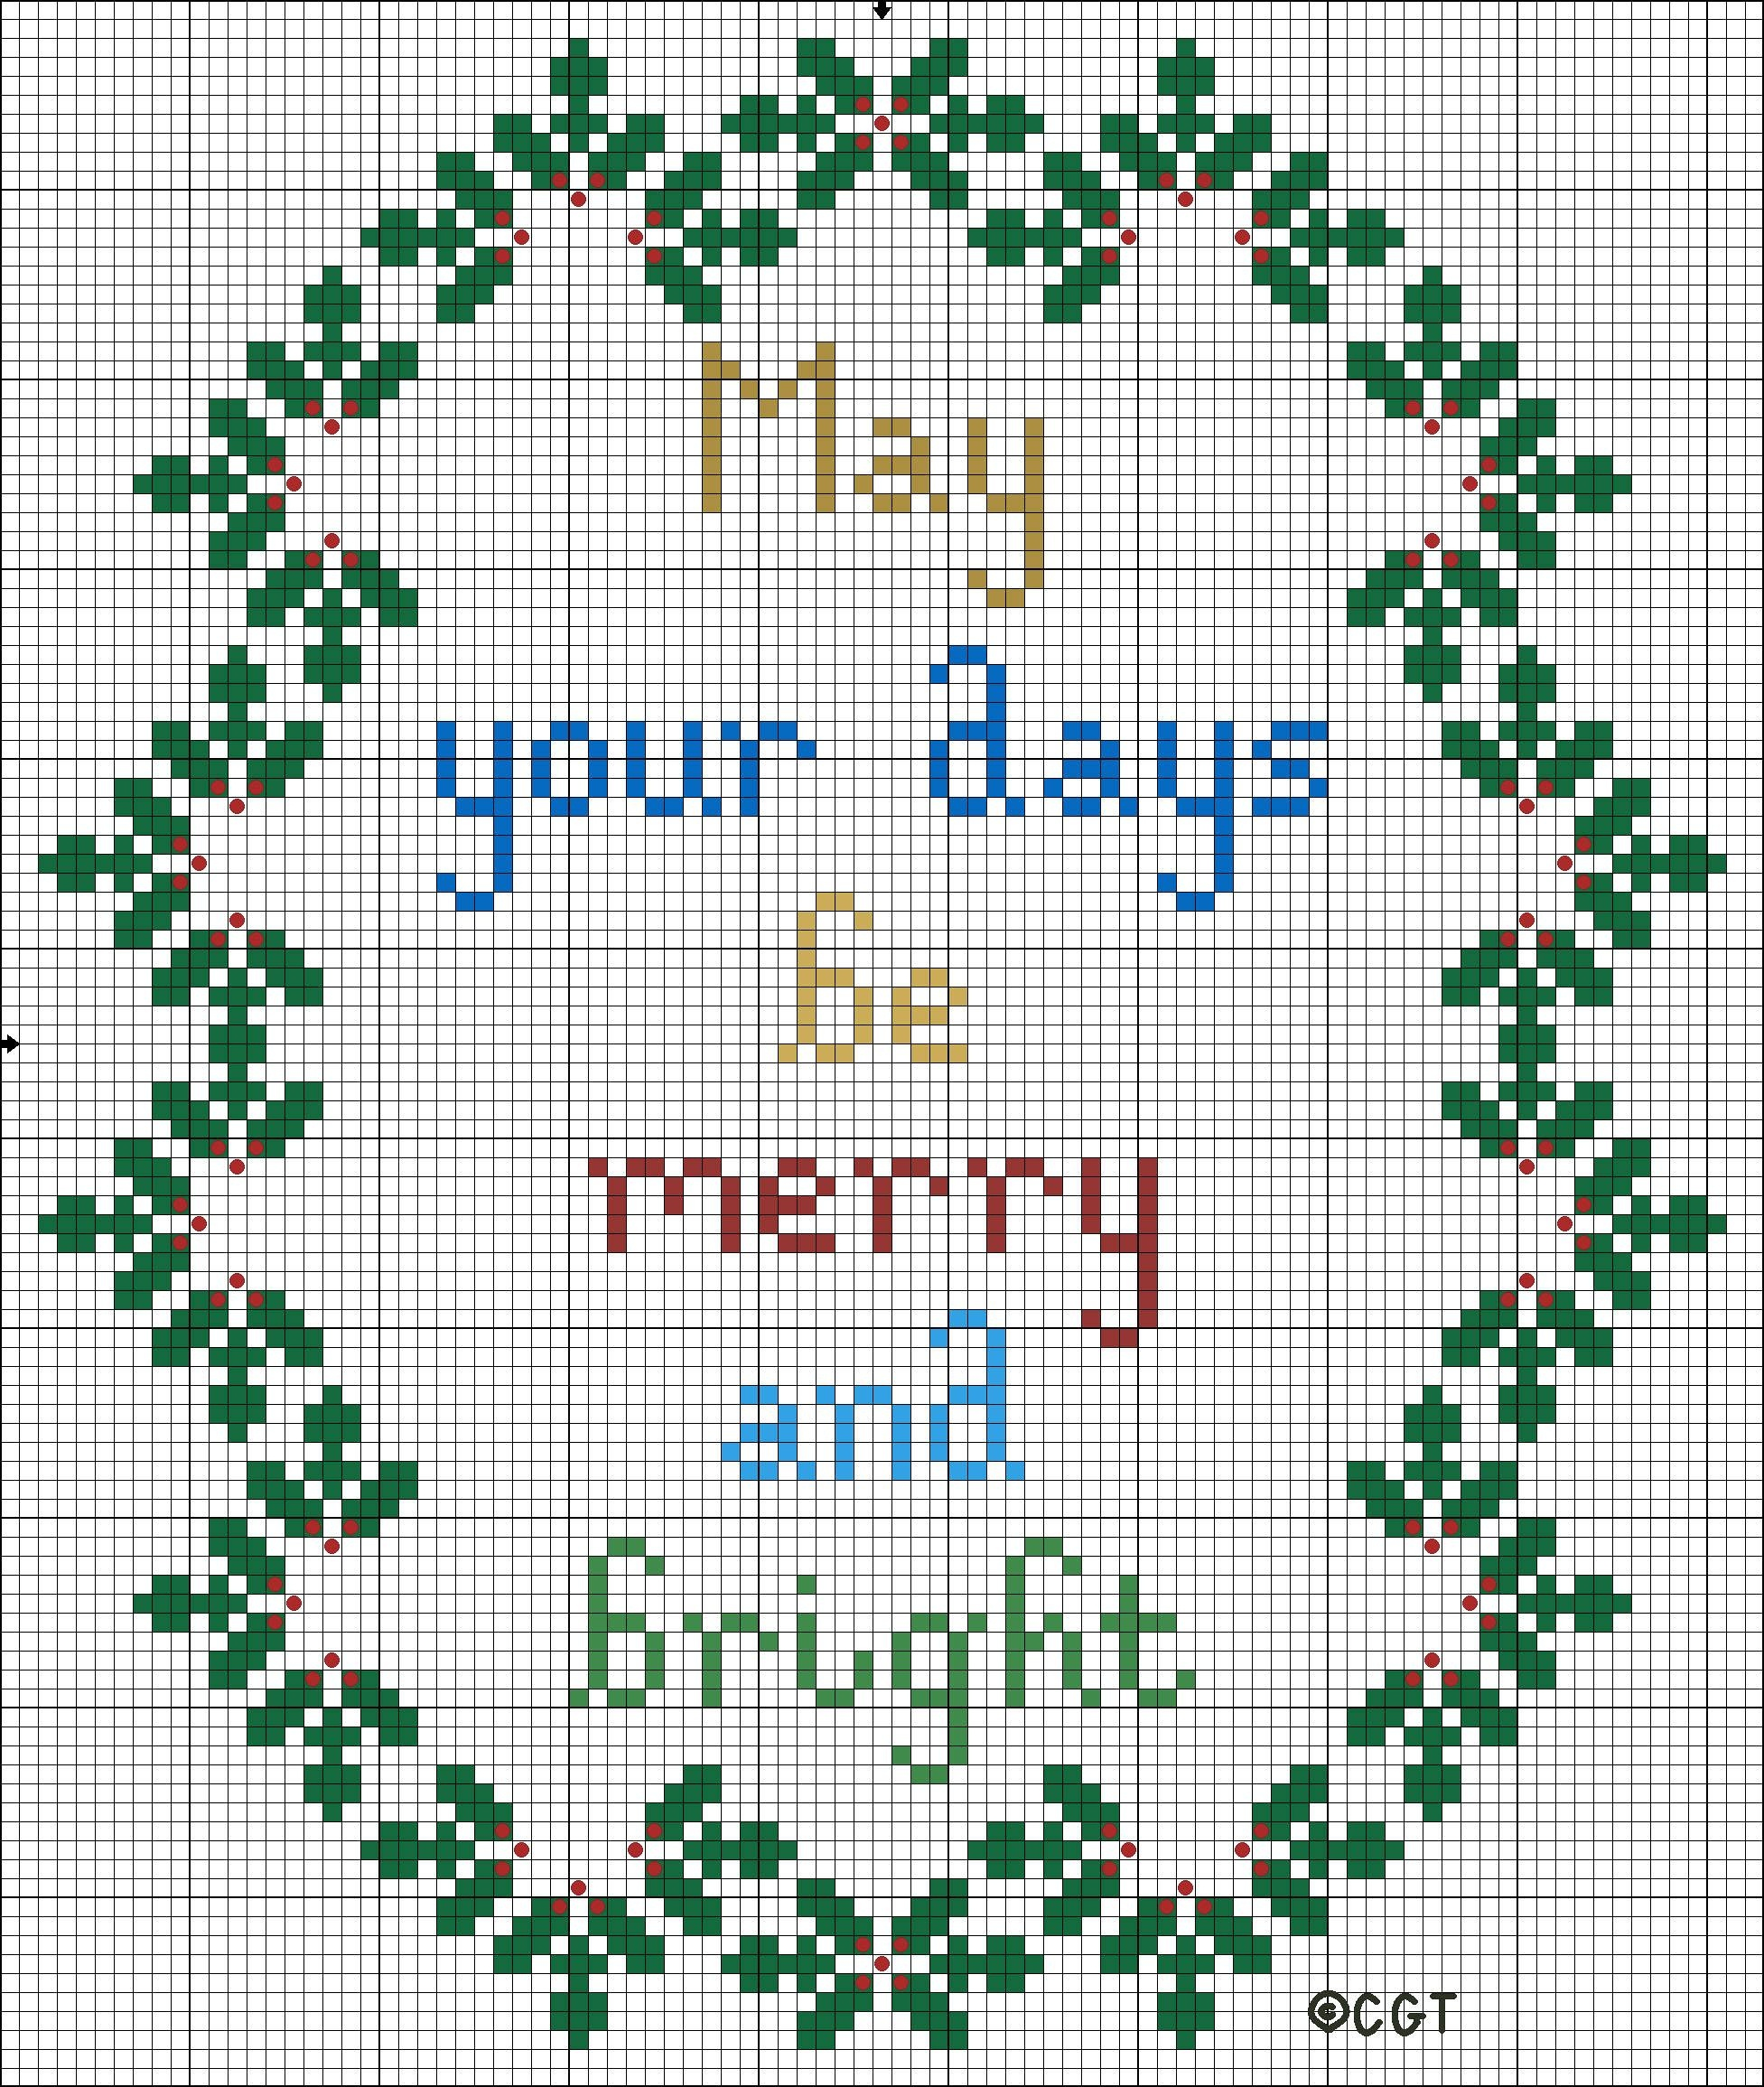 Free Merry And Bright Christmas Cross Stitch Pattern | Cross Stitch - Free Printable Christmas Ornament Cross Stitch Patterns